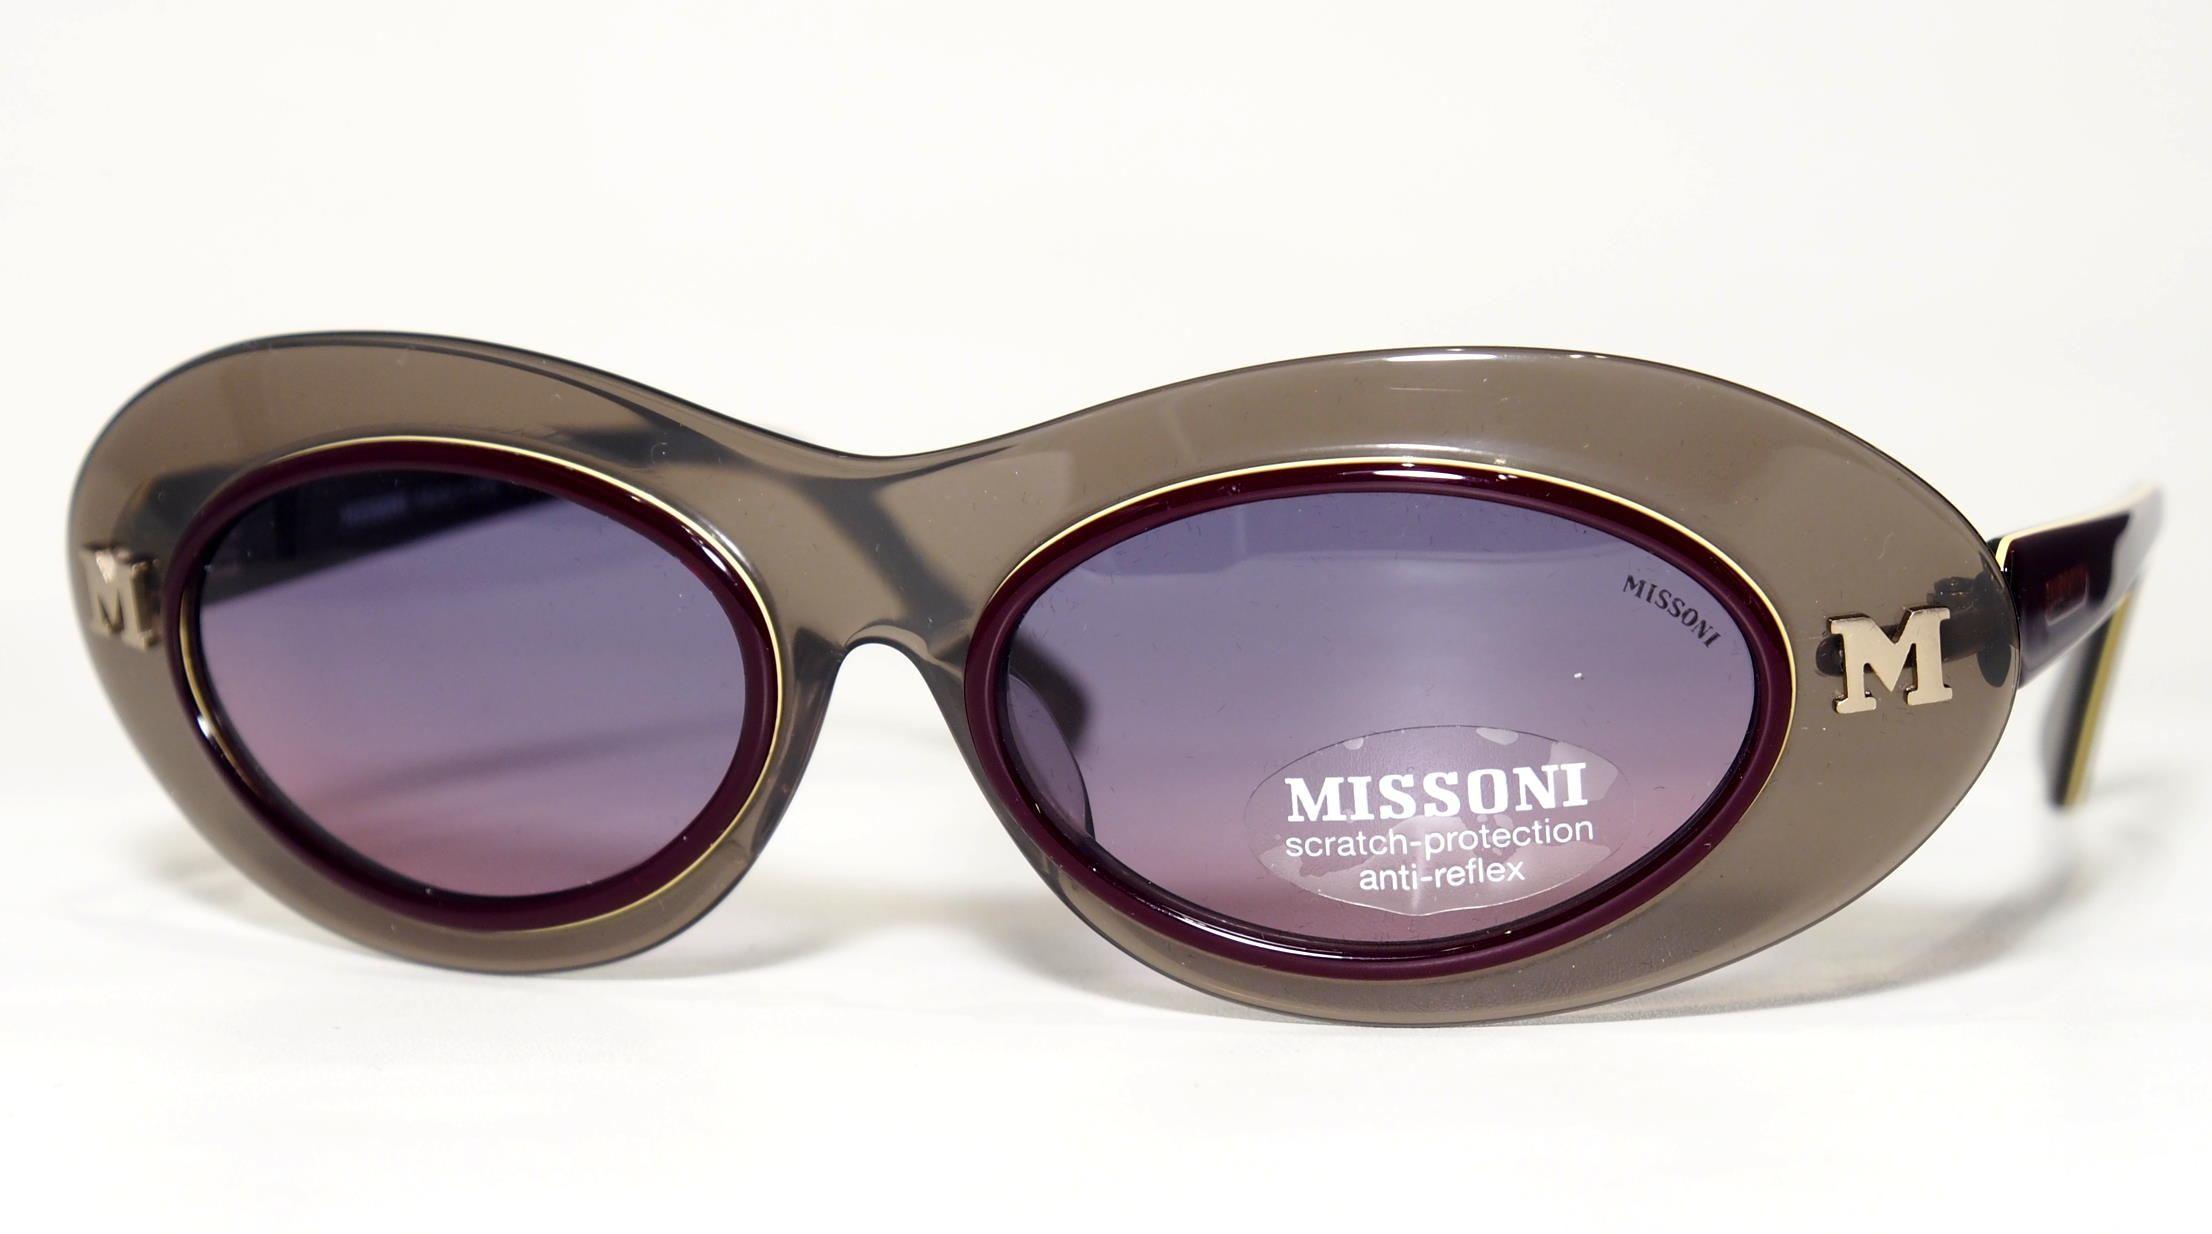 Vintage Sonnenbrille Missoni / 90er Jahre Kult-Sonnenbrille 0105 S 053